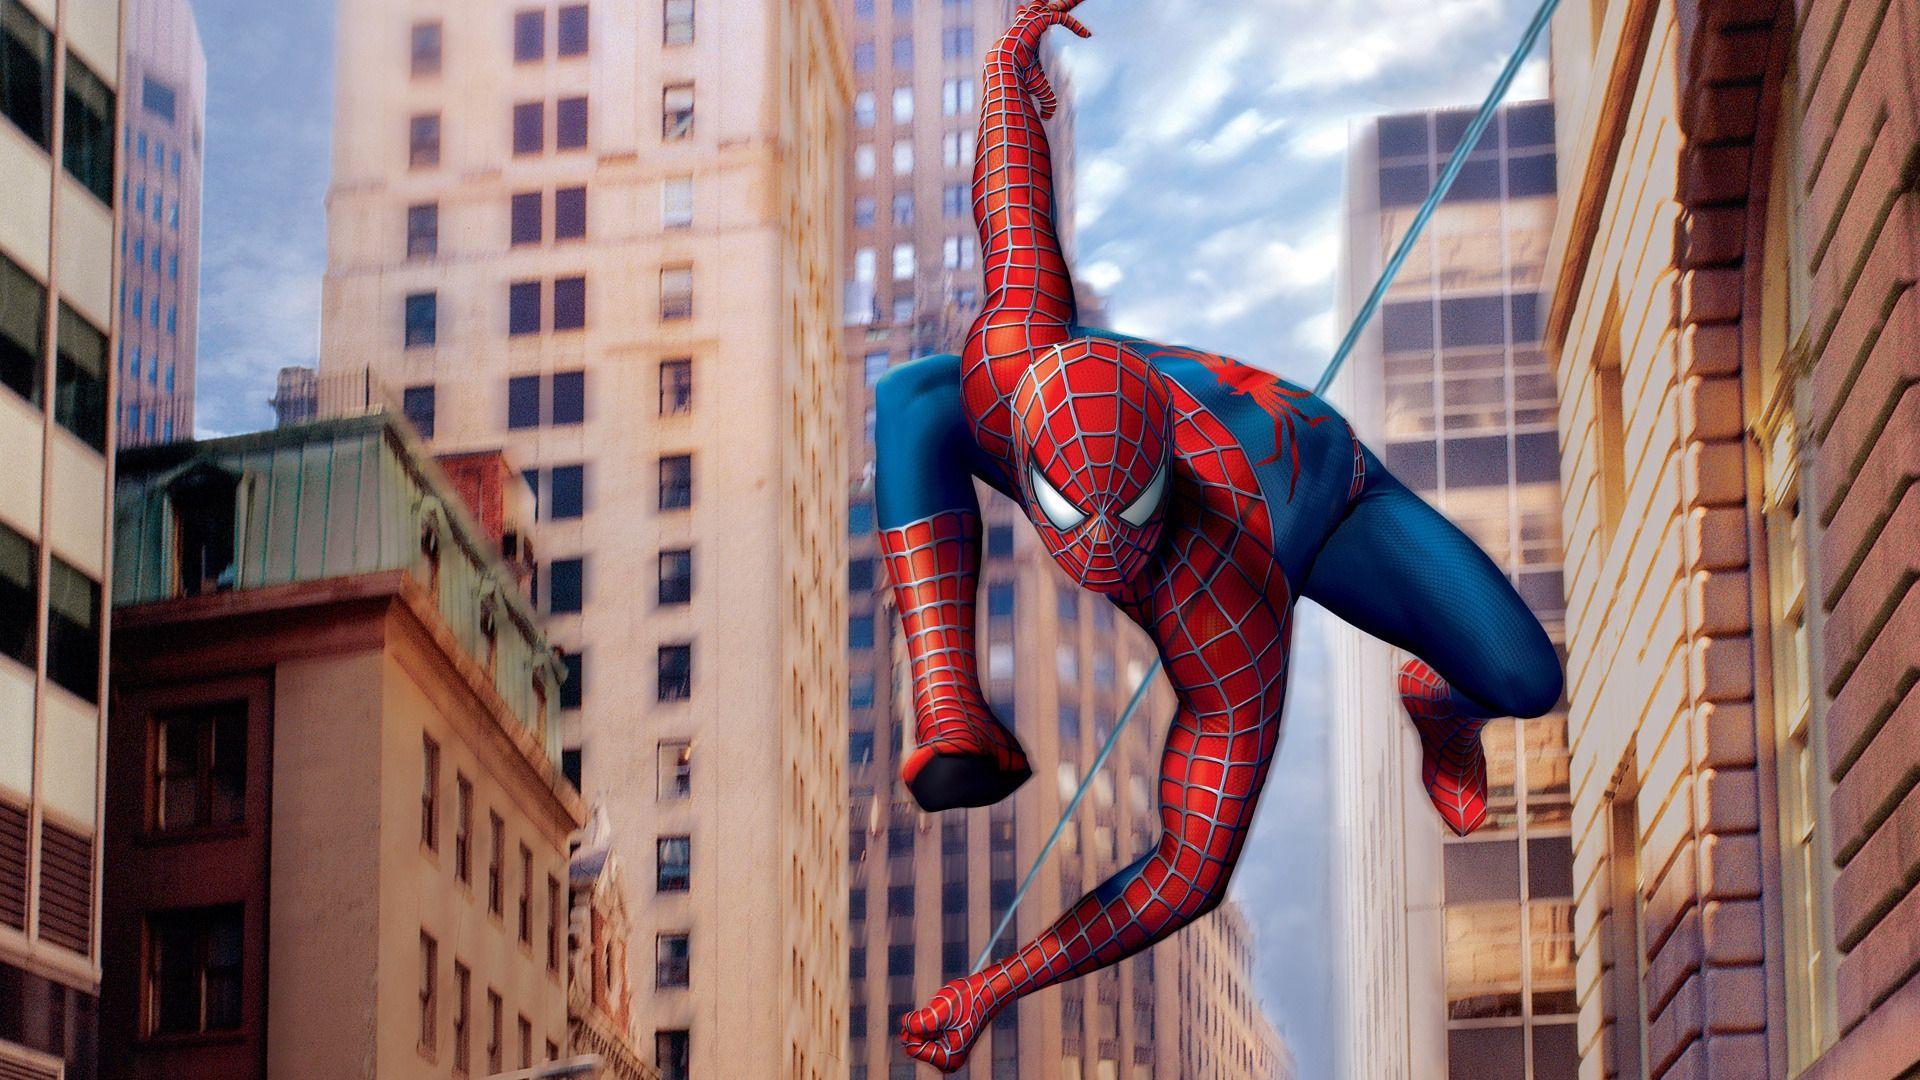 Spider Man 2 Wallpaper